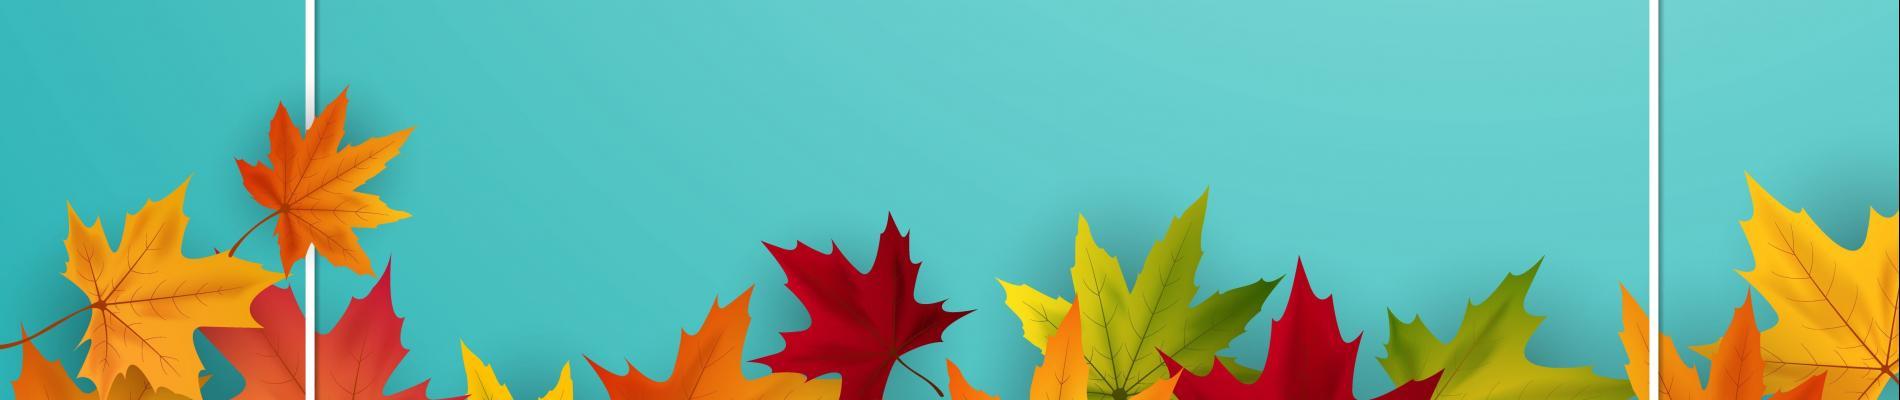 Fall Harvest Social